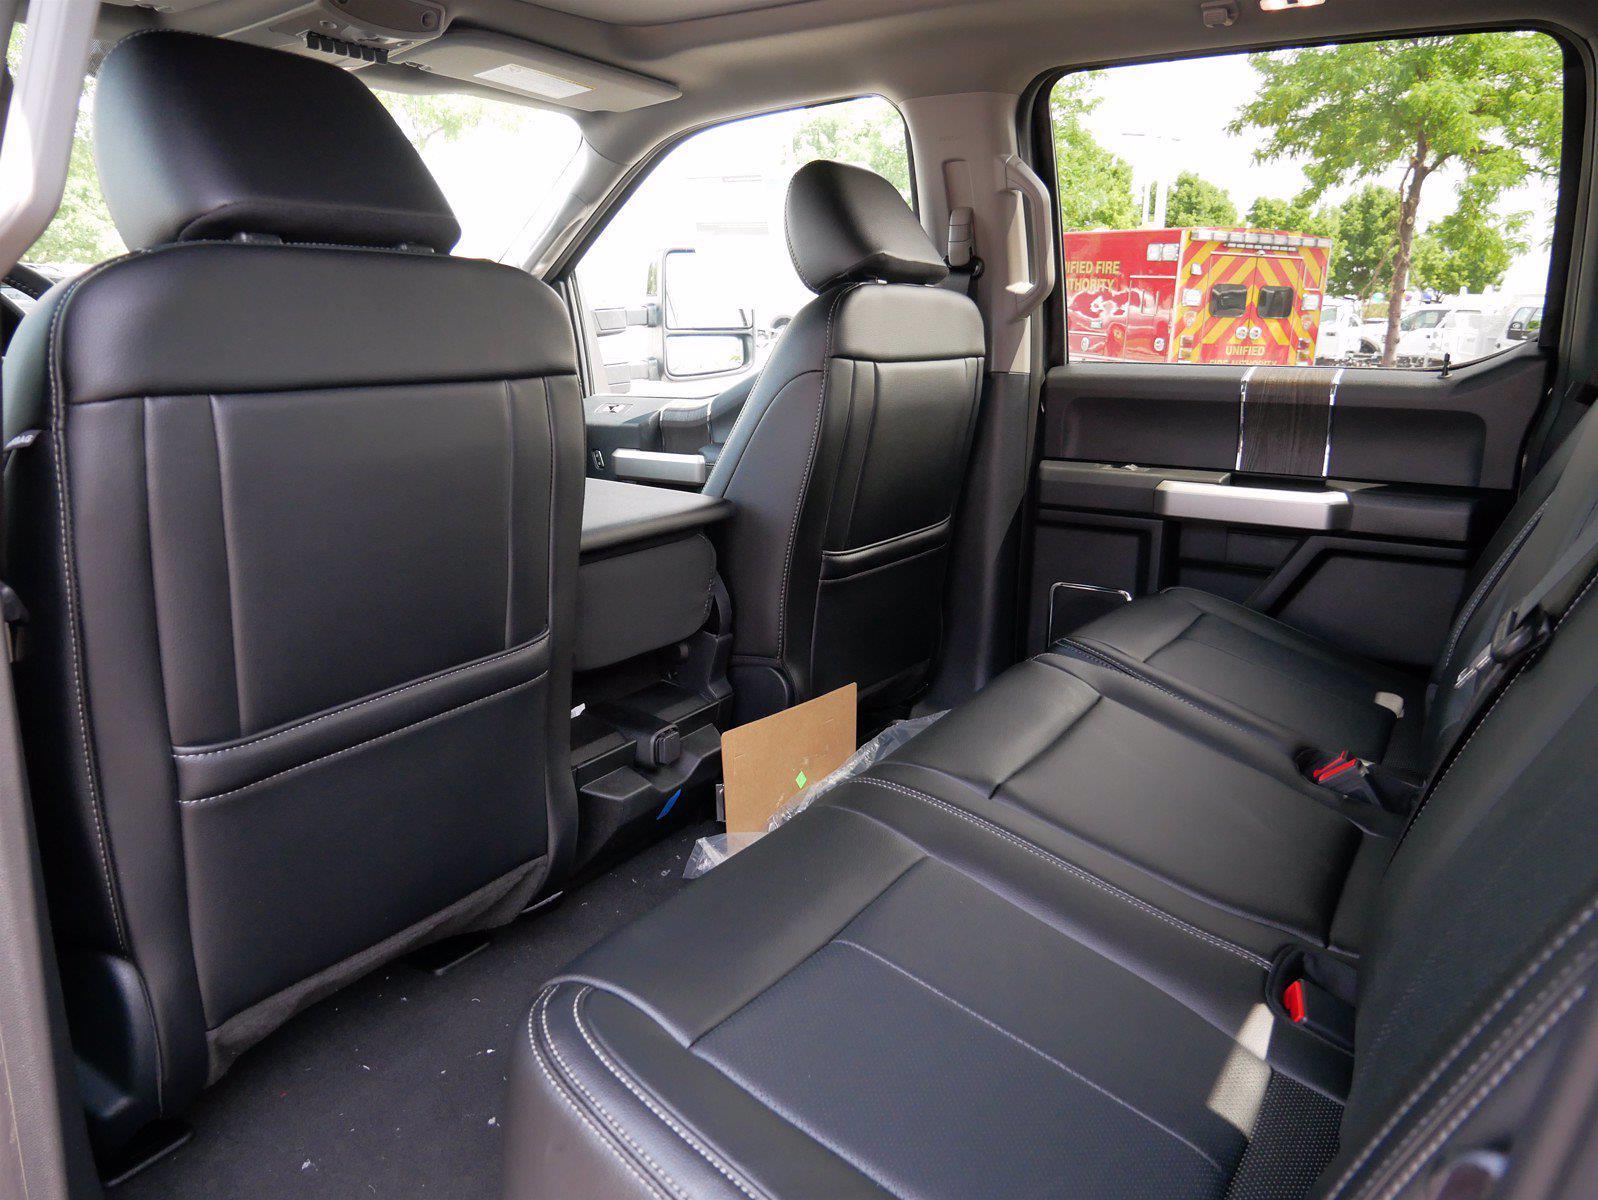 2021 Ford F-350 Crew Cab 4x4, Pickup #24539 - photo 28